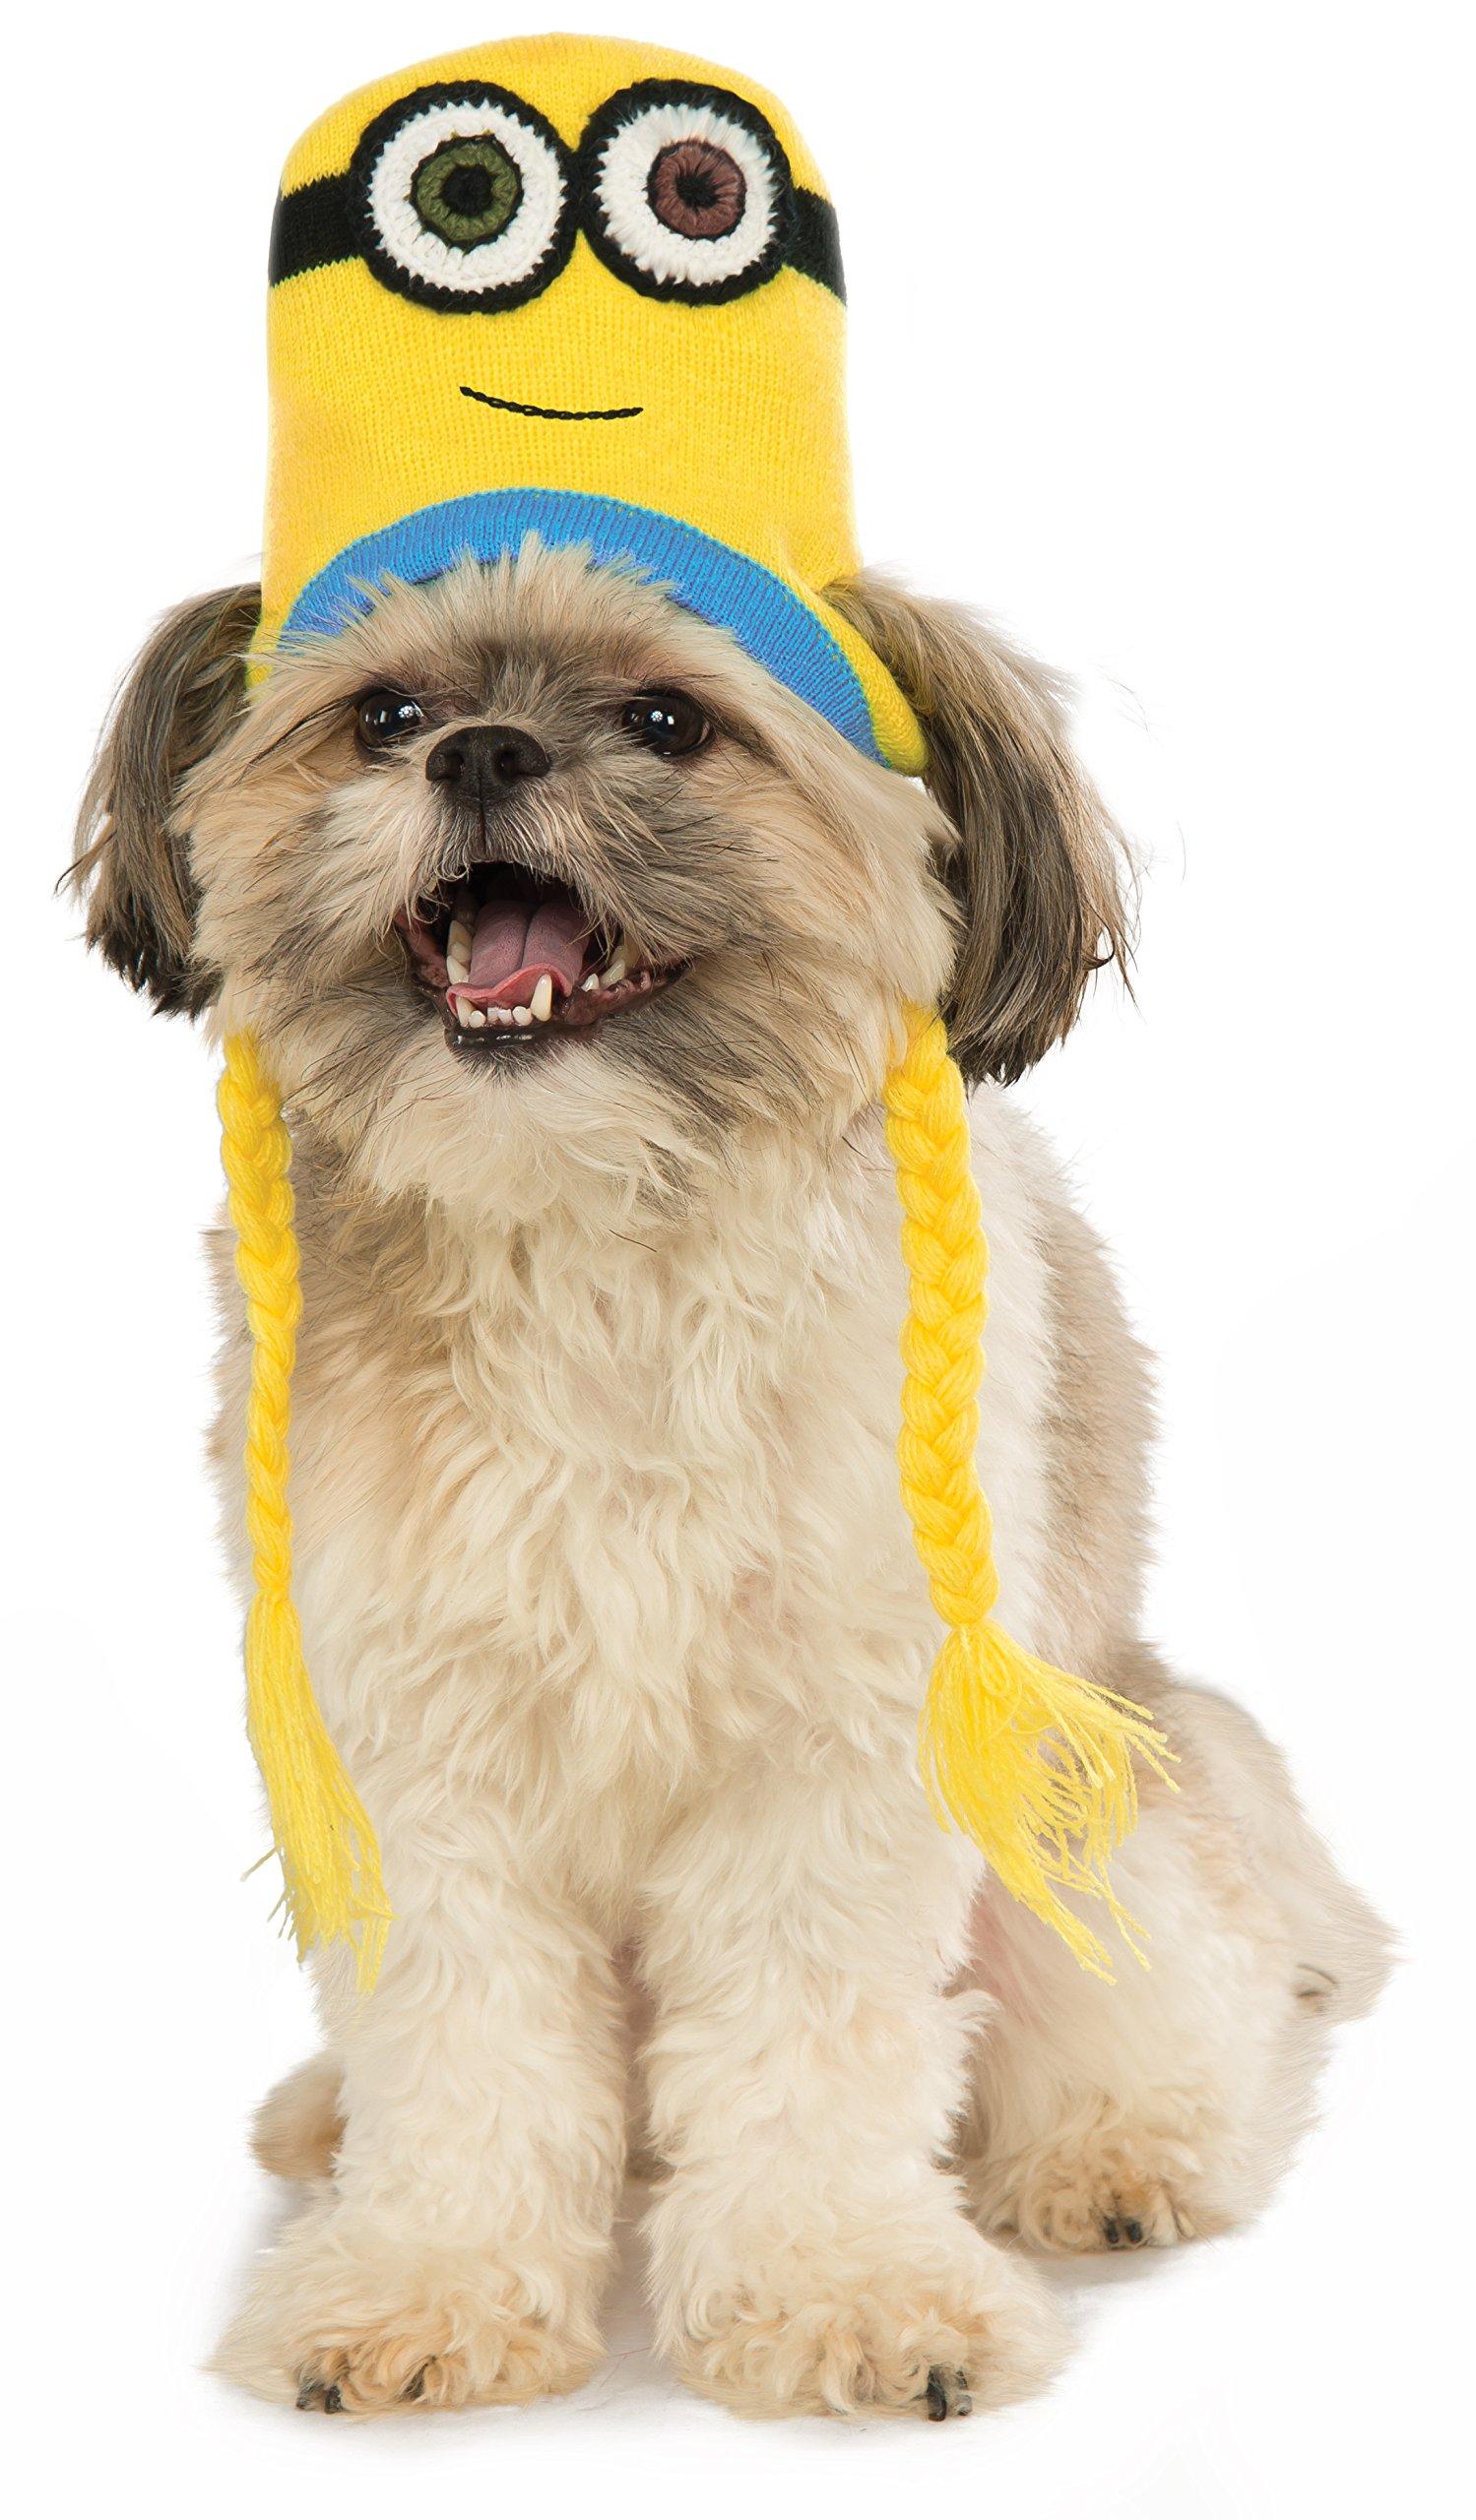 Minion Bob Knit Dog Headpiece, Small/Medium